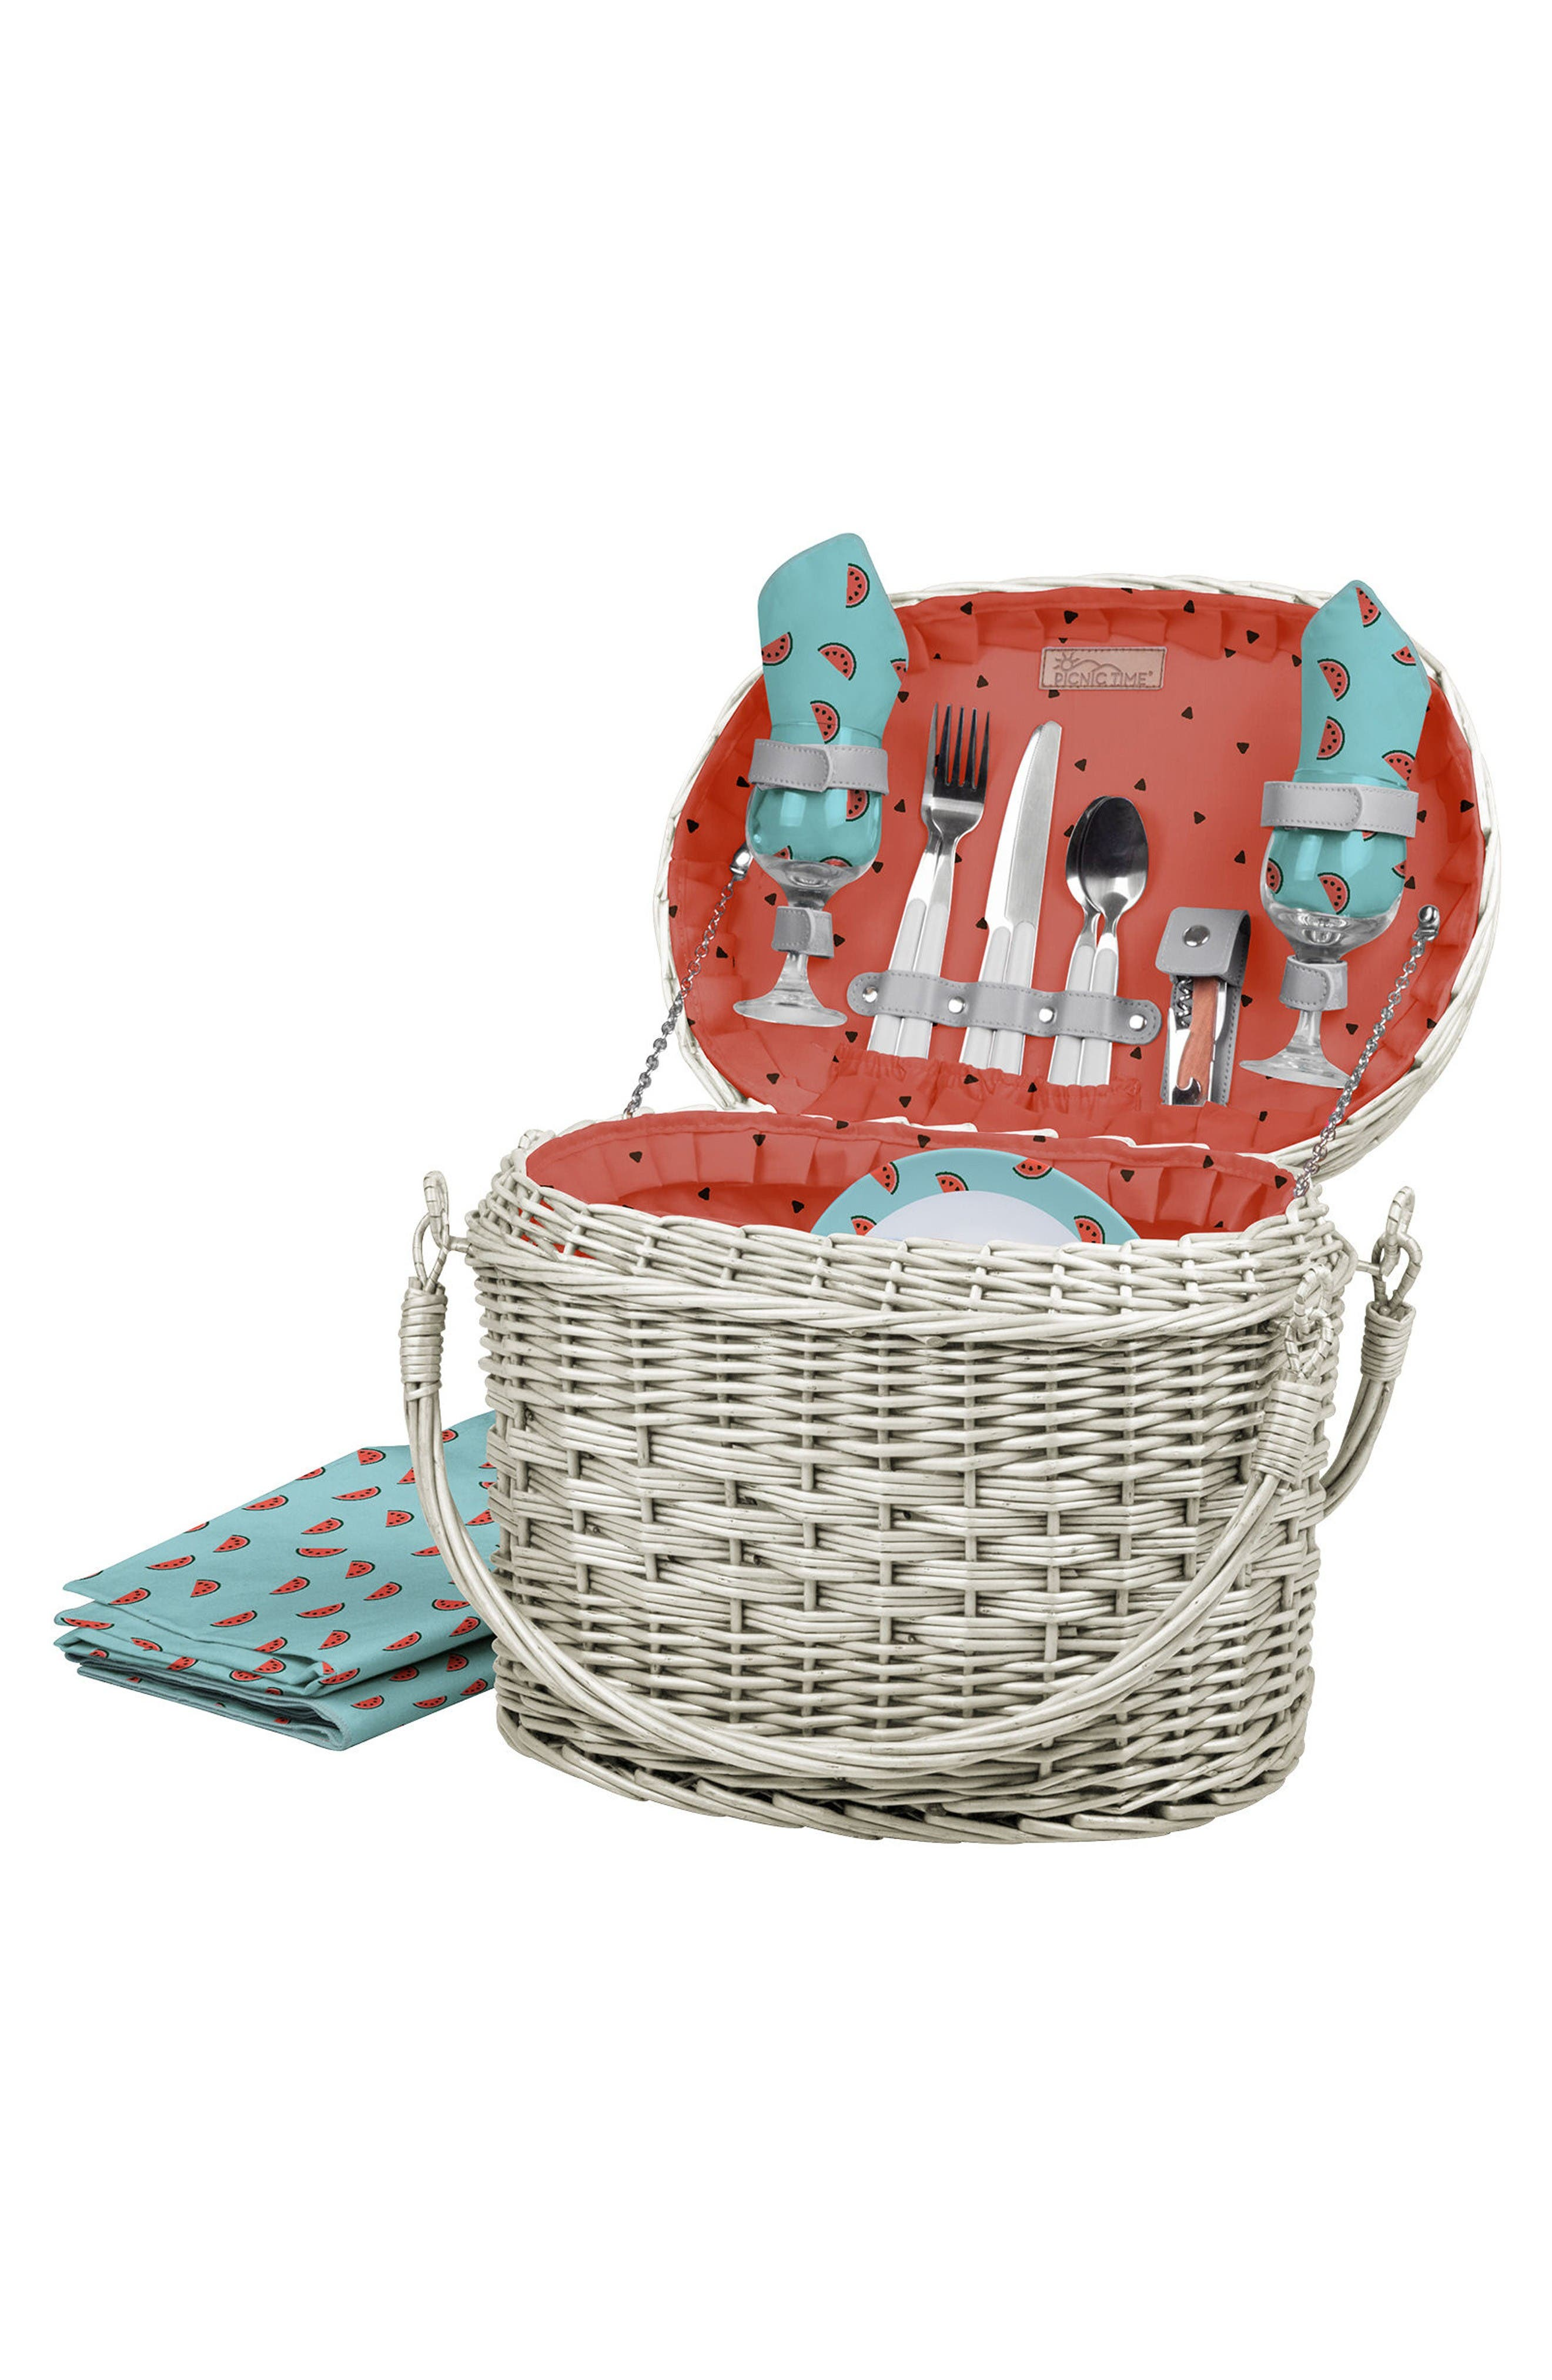 Main Image - Picnic Time Romance Picnic Basket